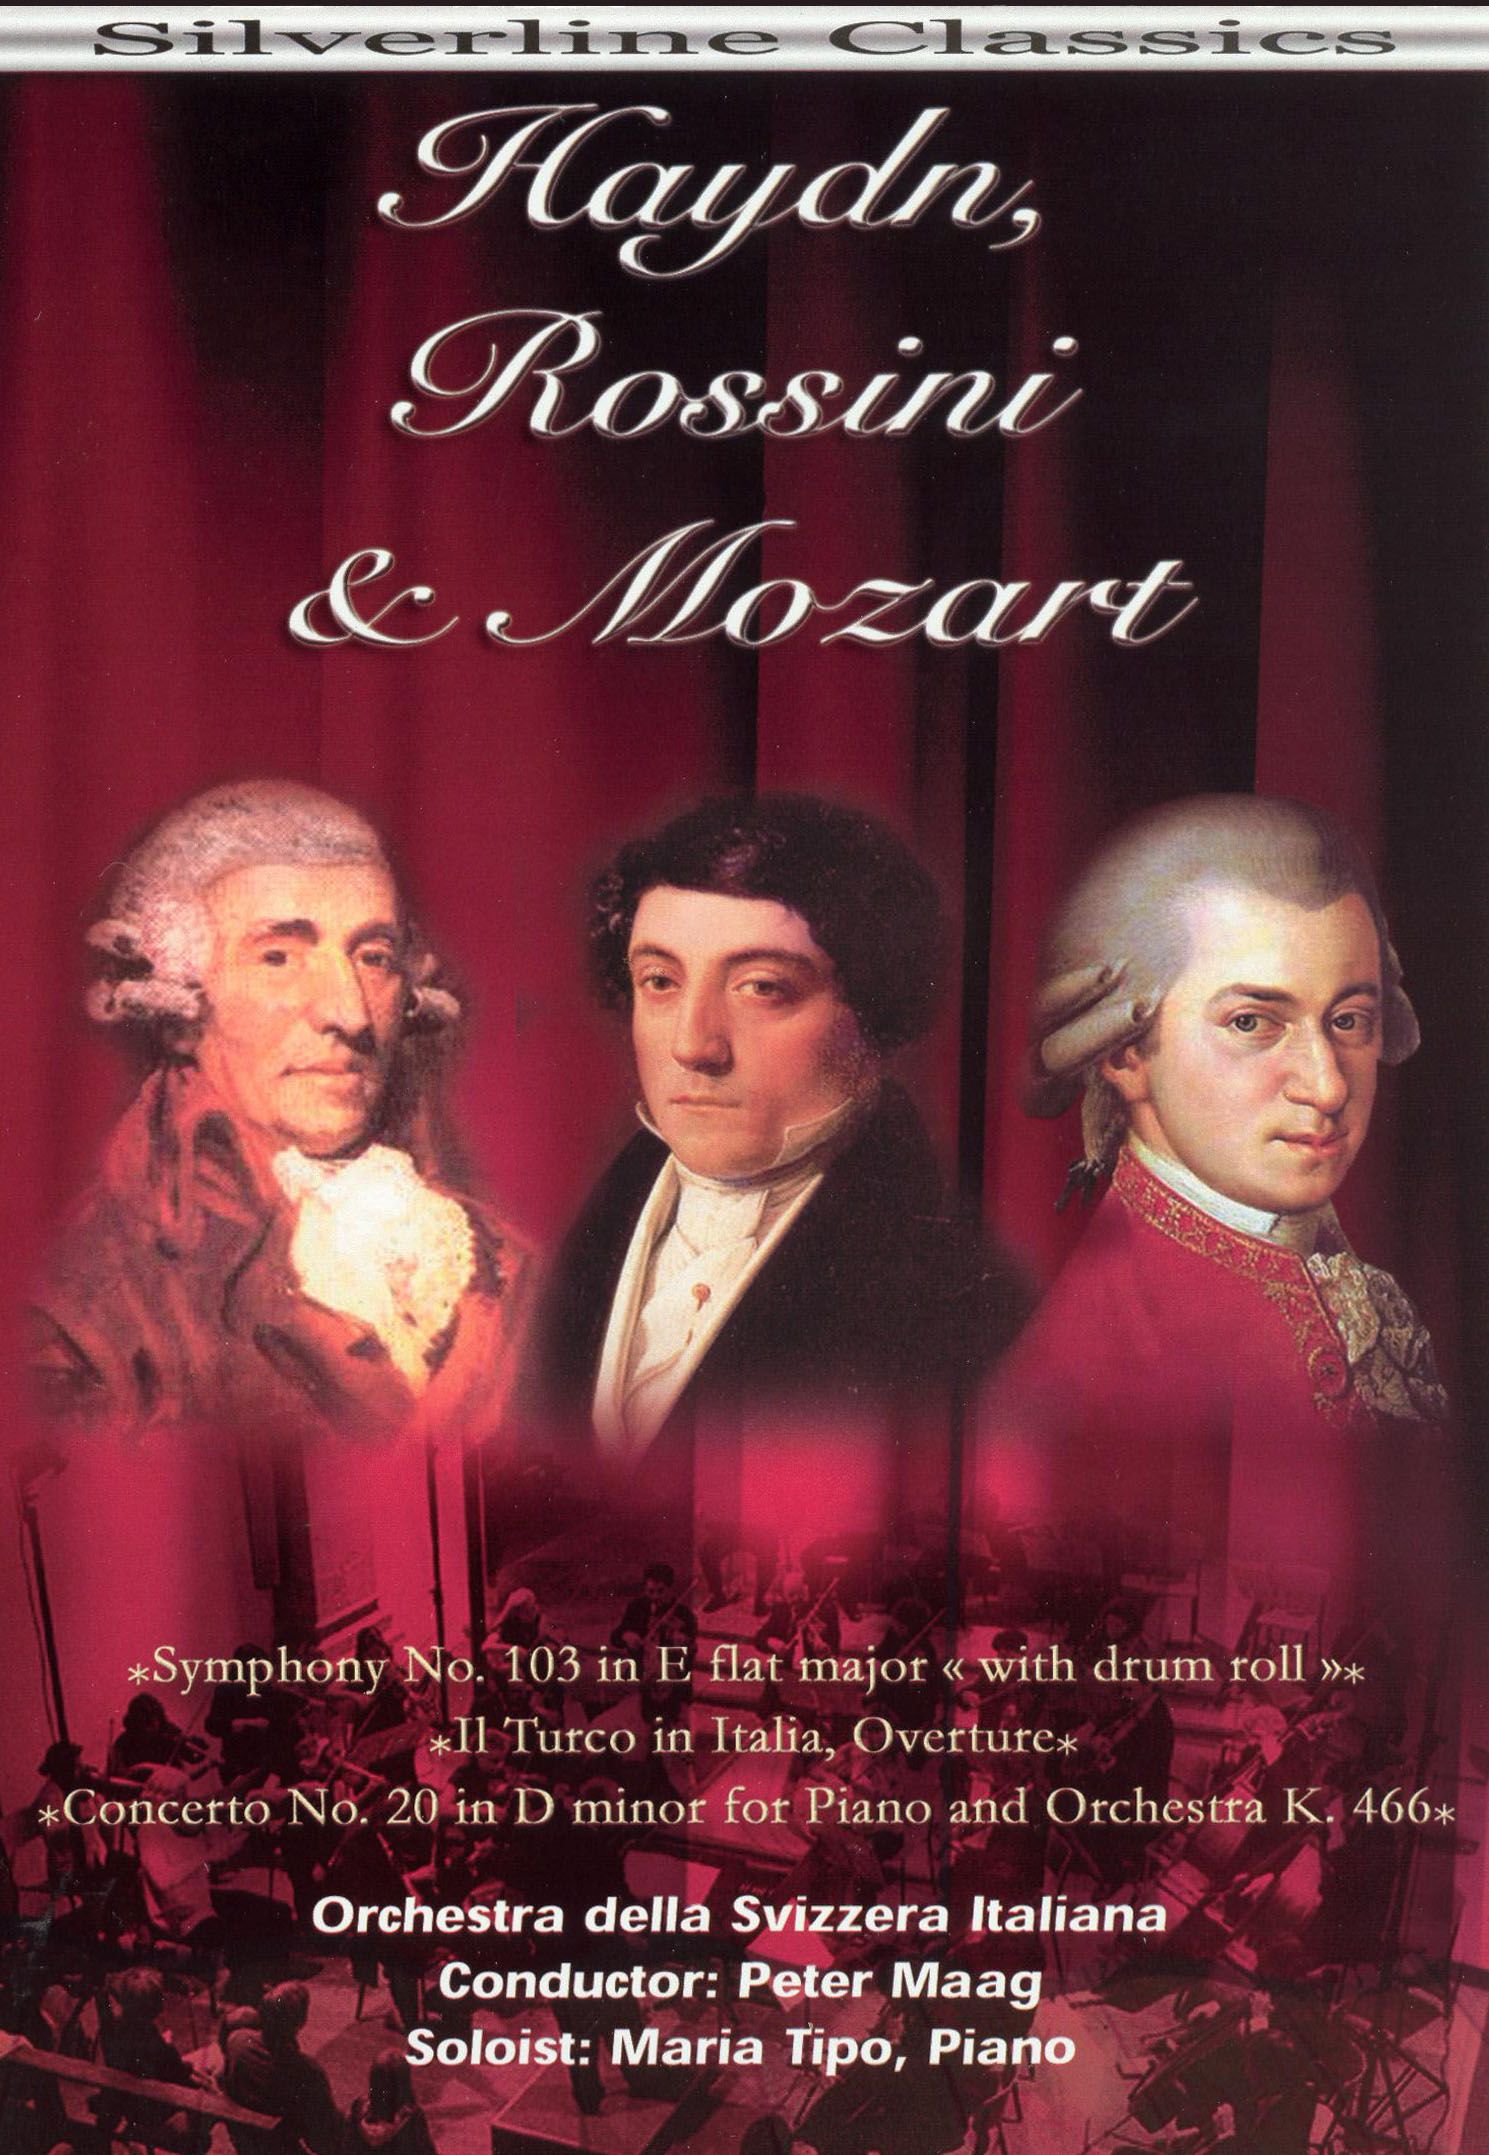 Haydn, Rossini, Mozart